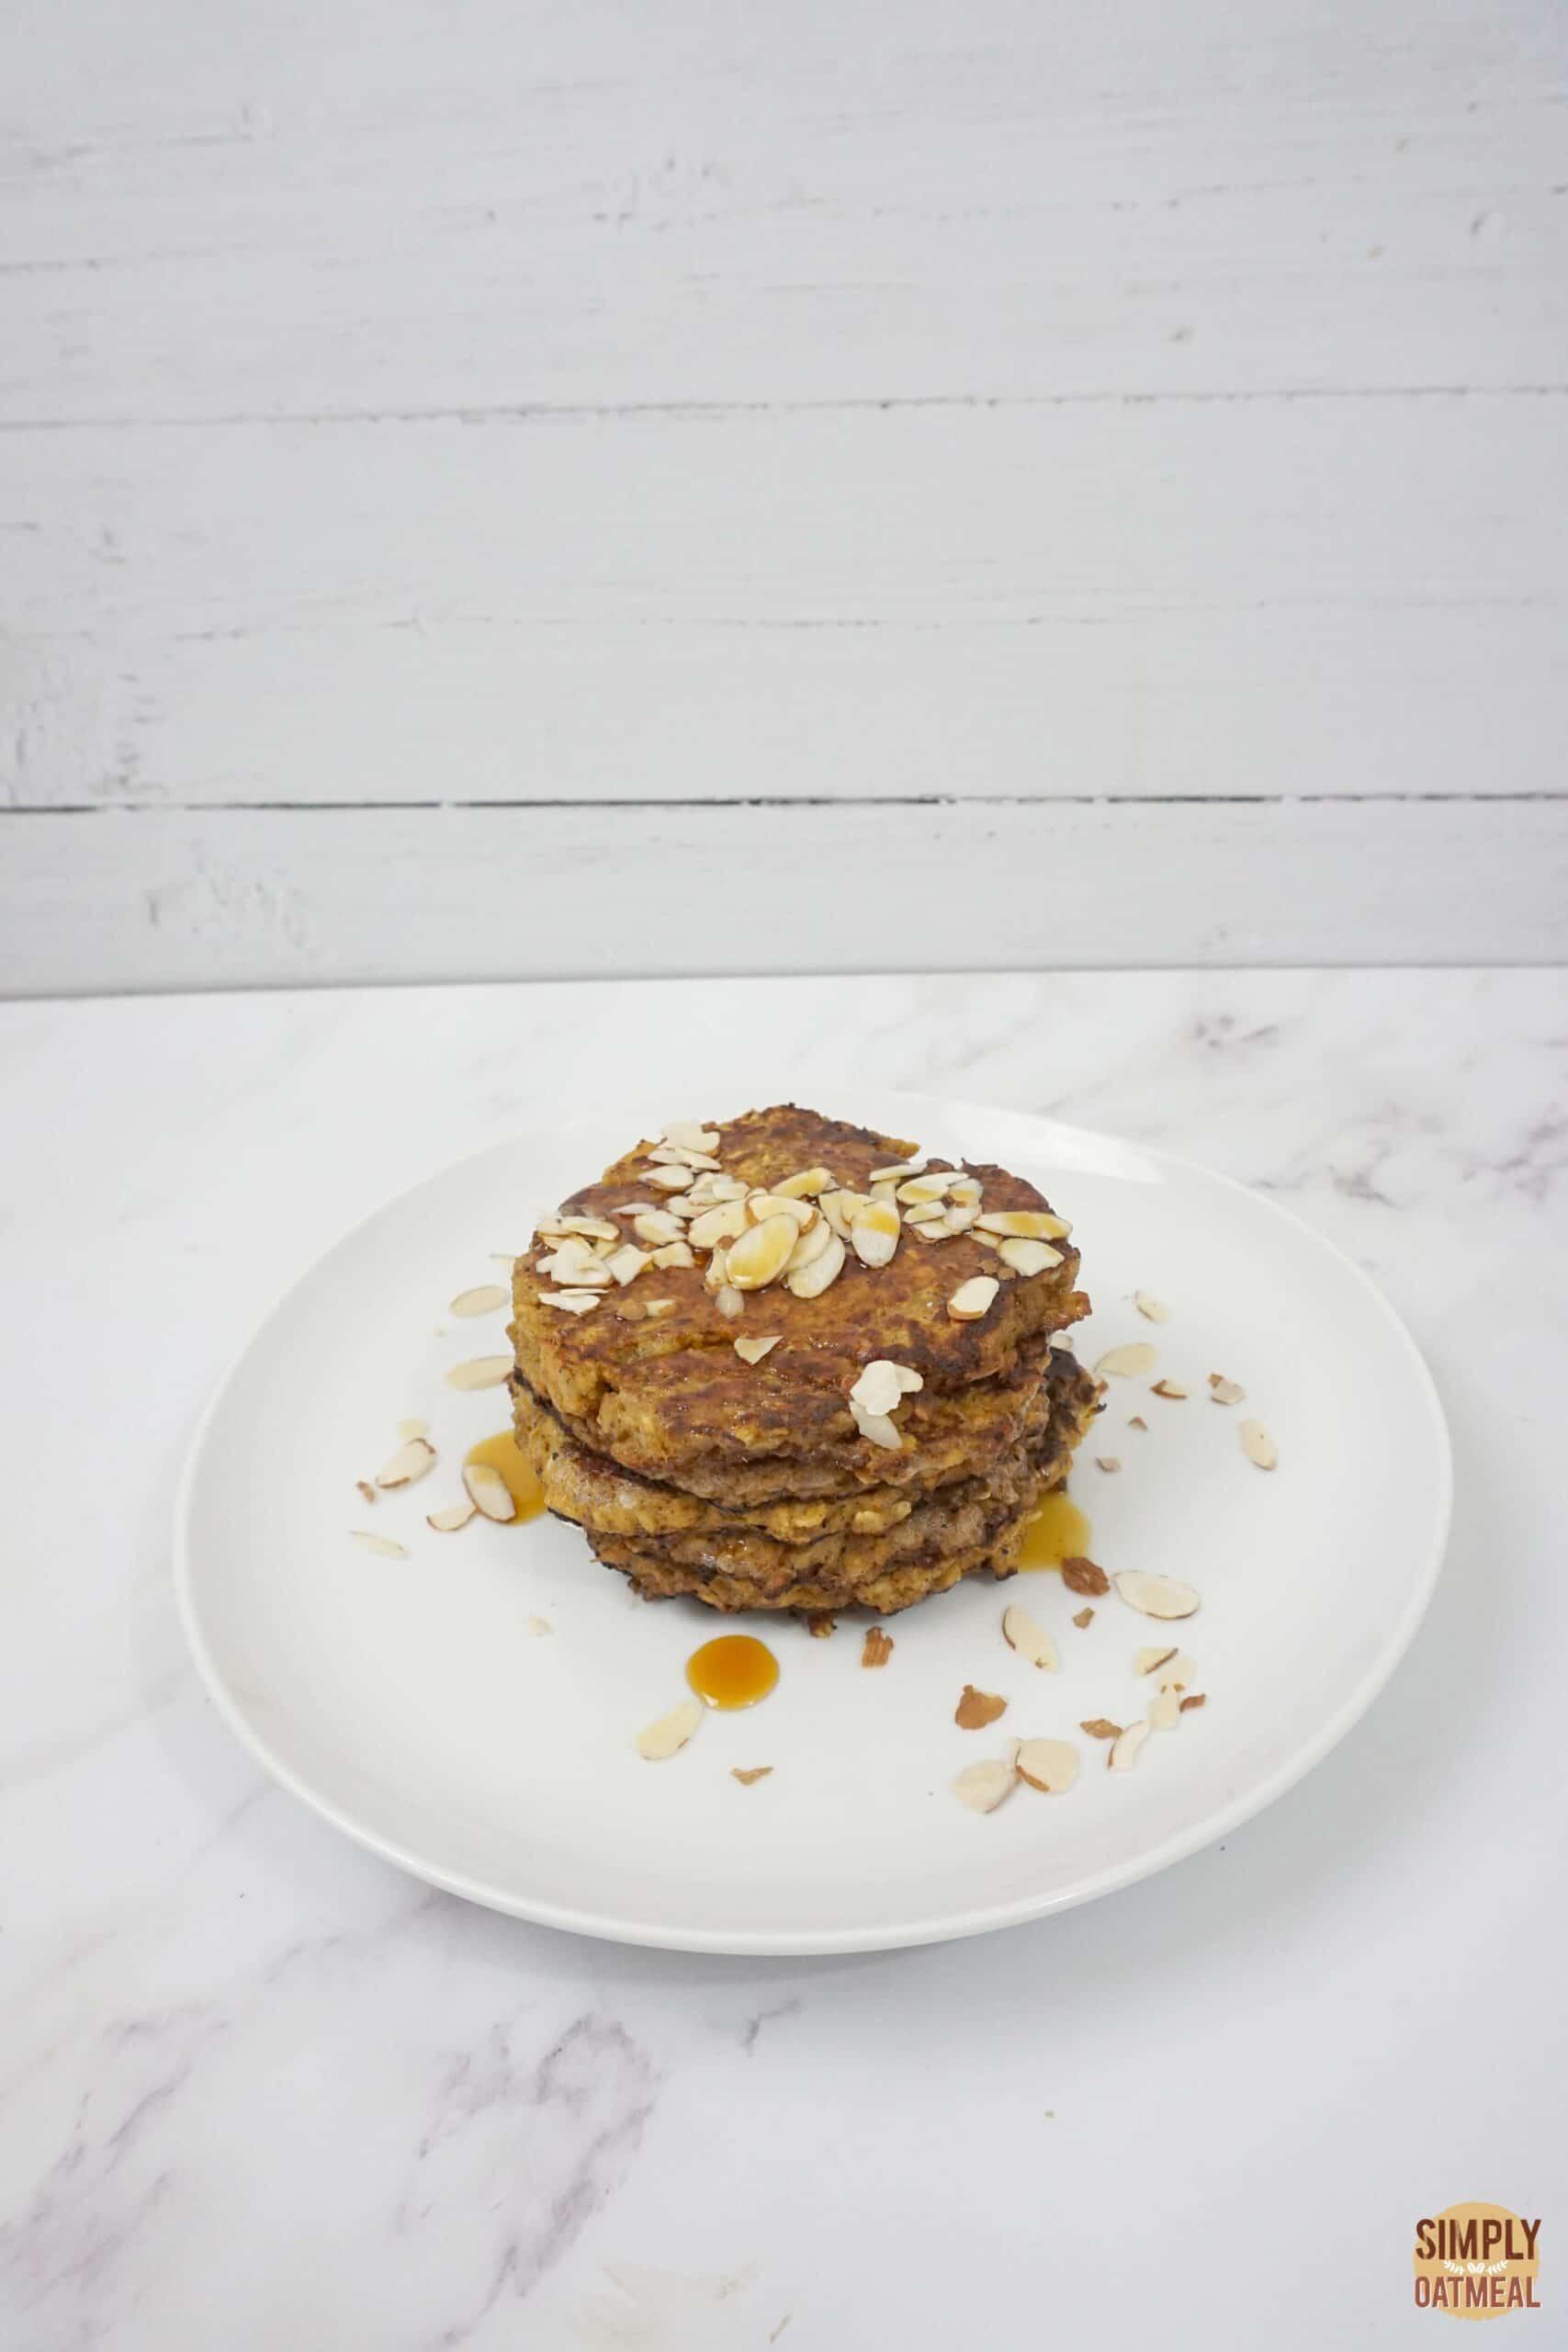 Sweet potato oatmeal pancakes with sliced almonds